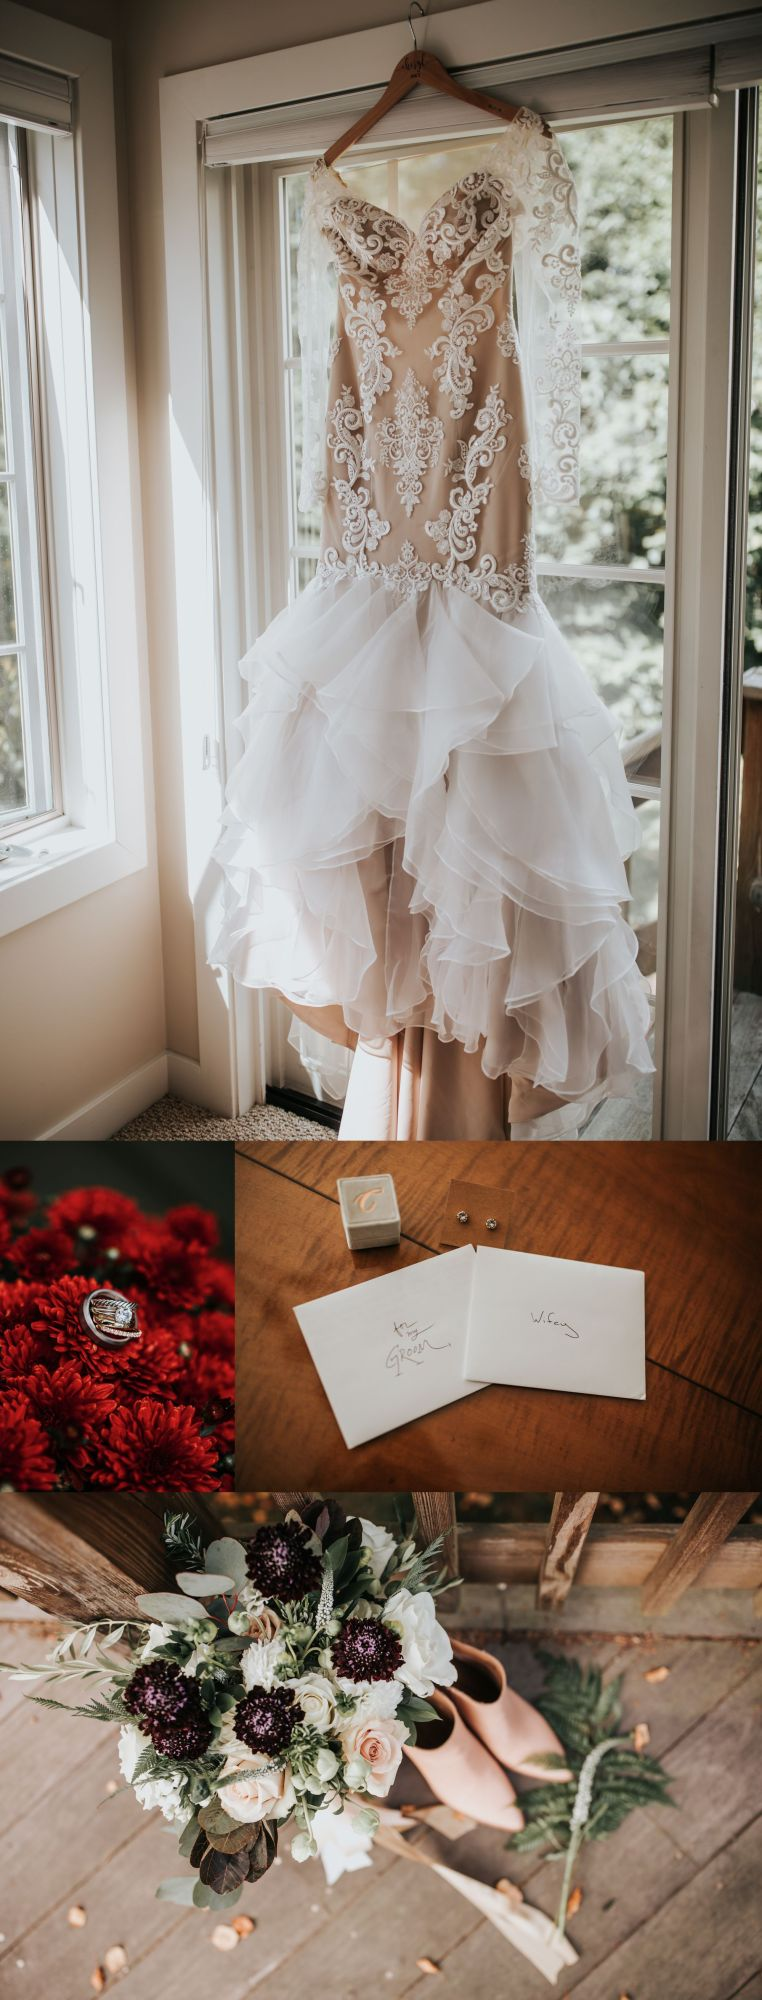 Details of Wedding